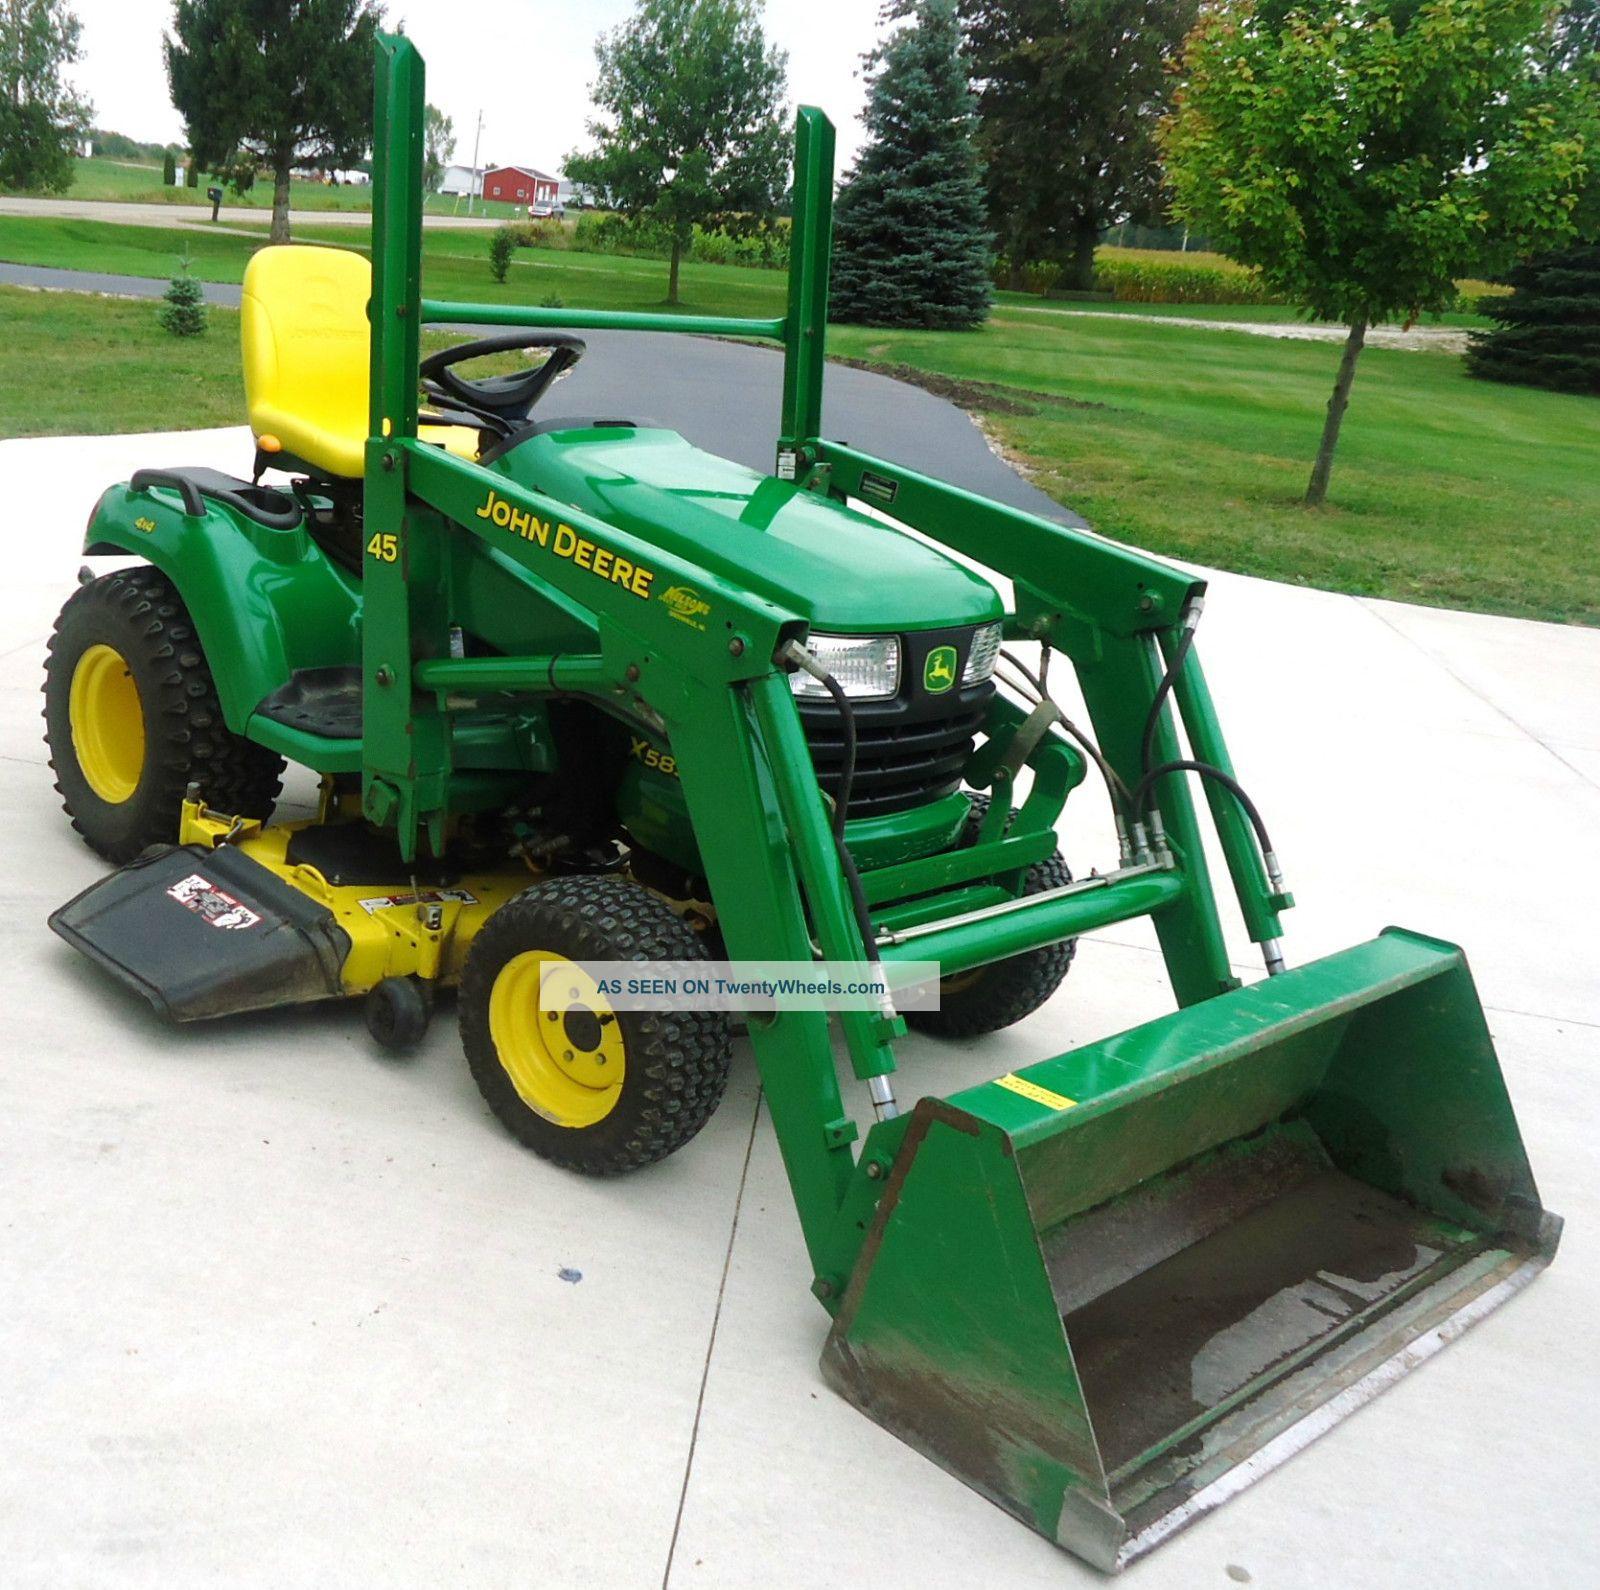 John Deere Garden Tractor W More Tractors Ford Lgt 125 Wiring Diagram 2004 X 585 4x4 Loader